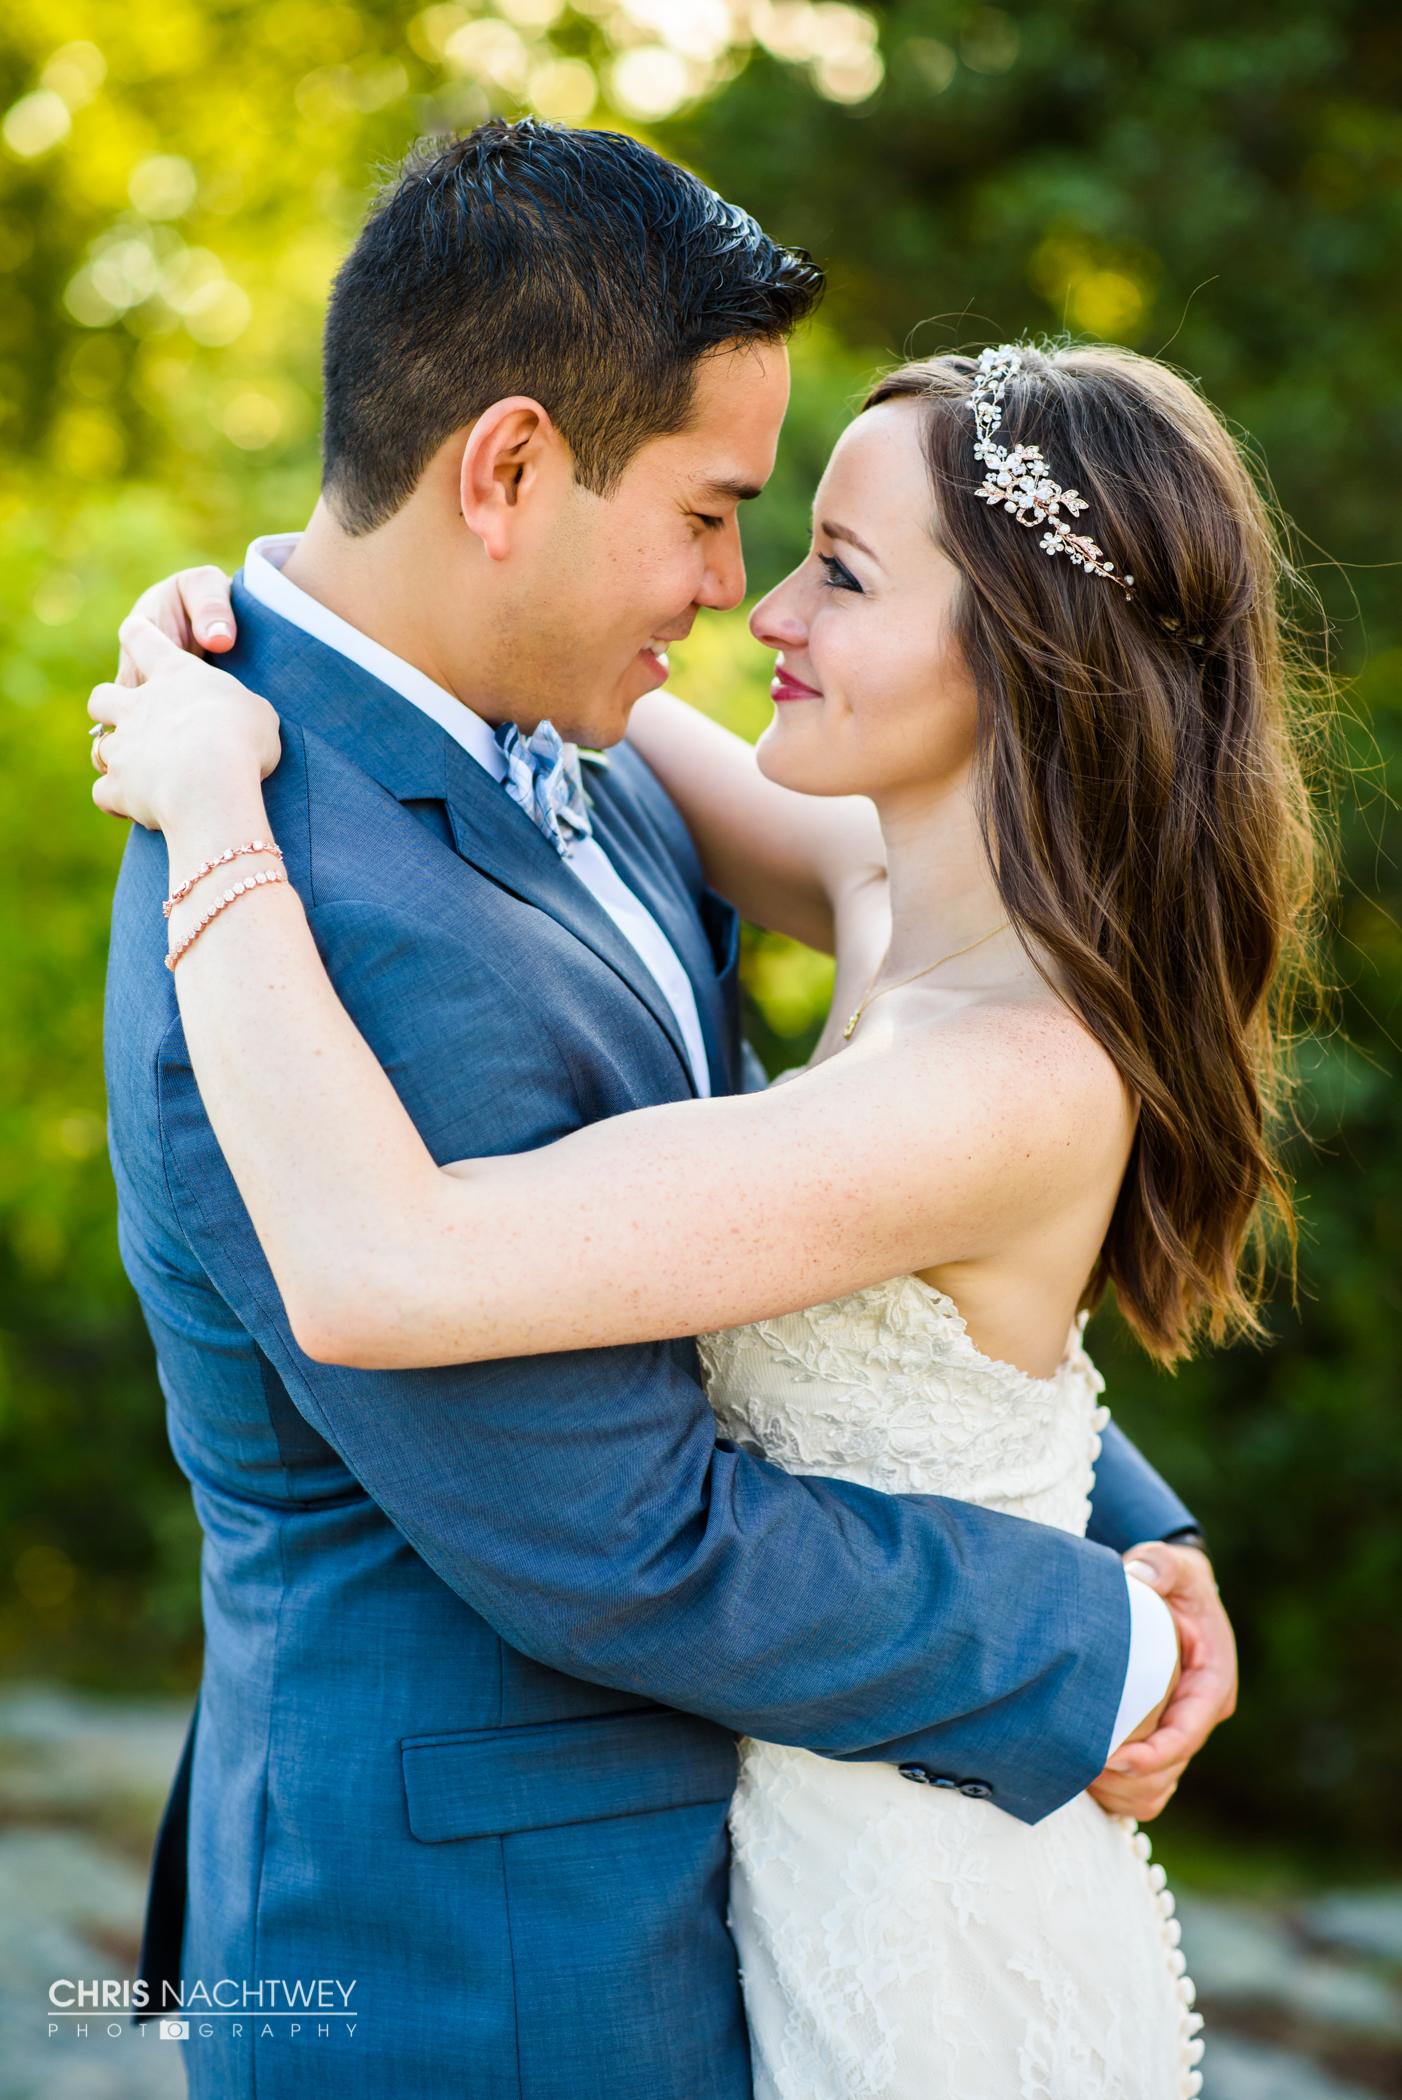 inn-at-mystic-connecticut-wedding-photographer-chris-nachtwey-20.jpg